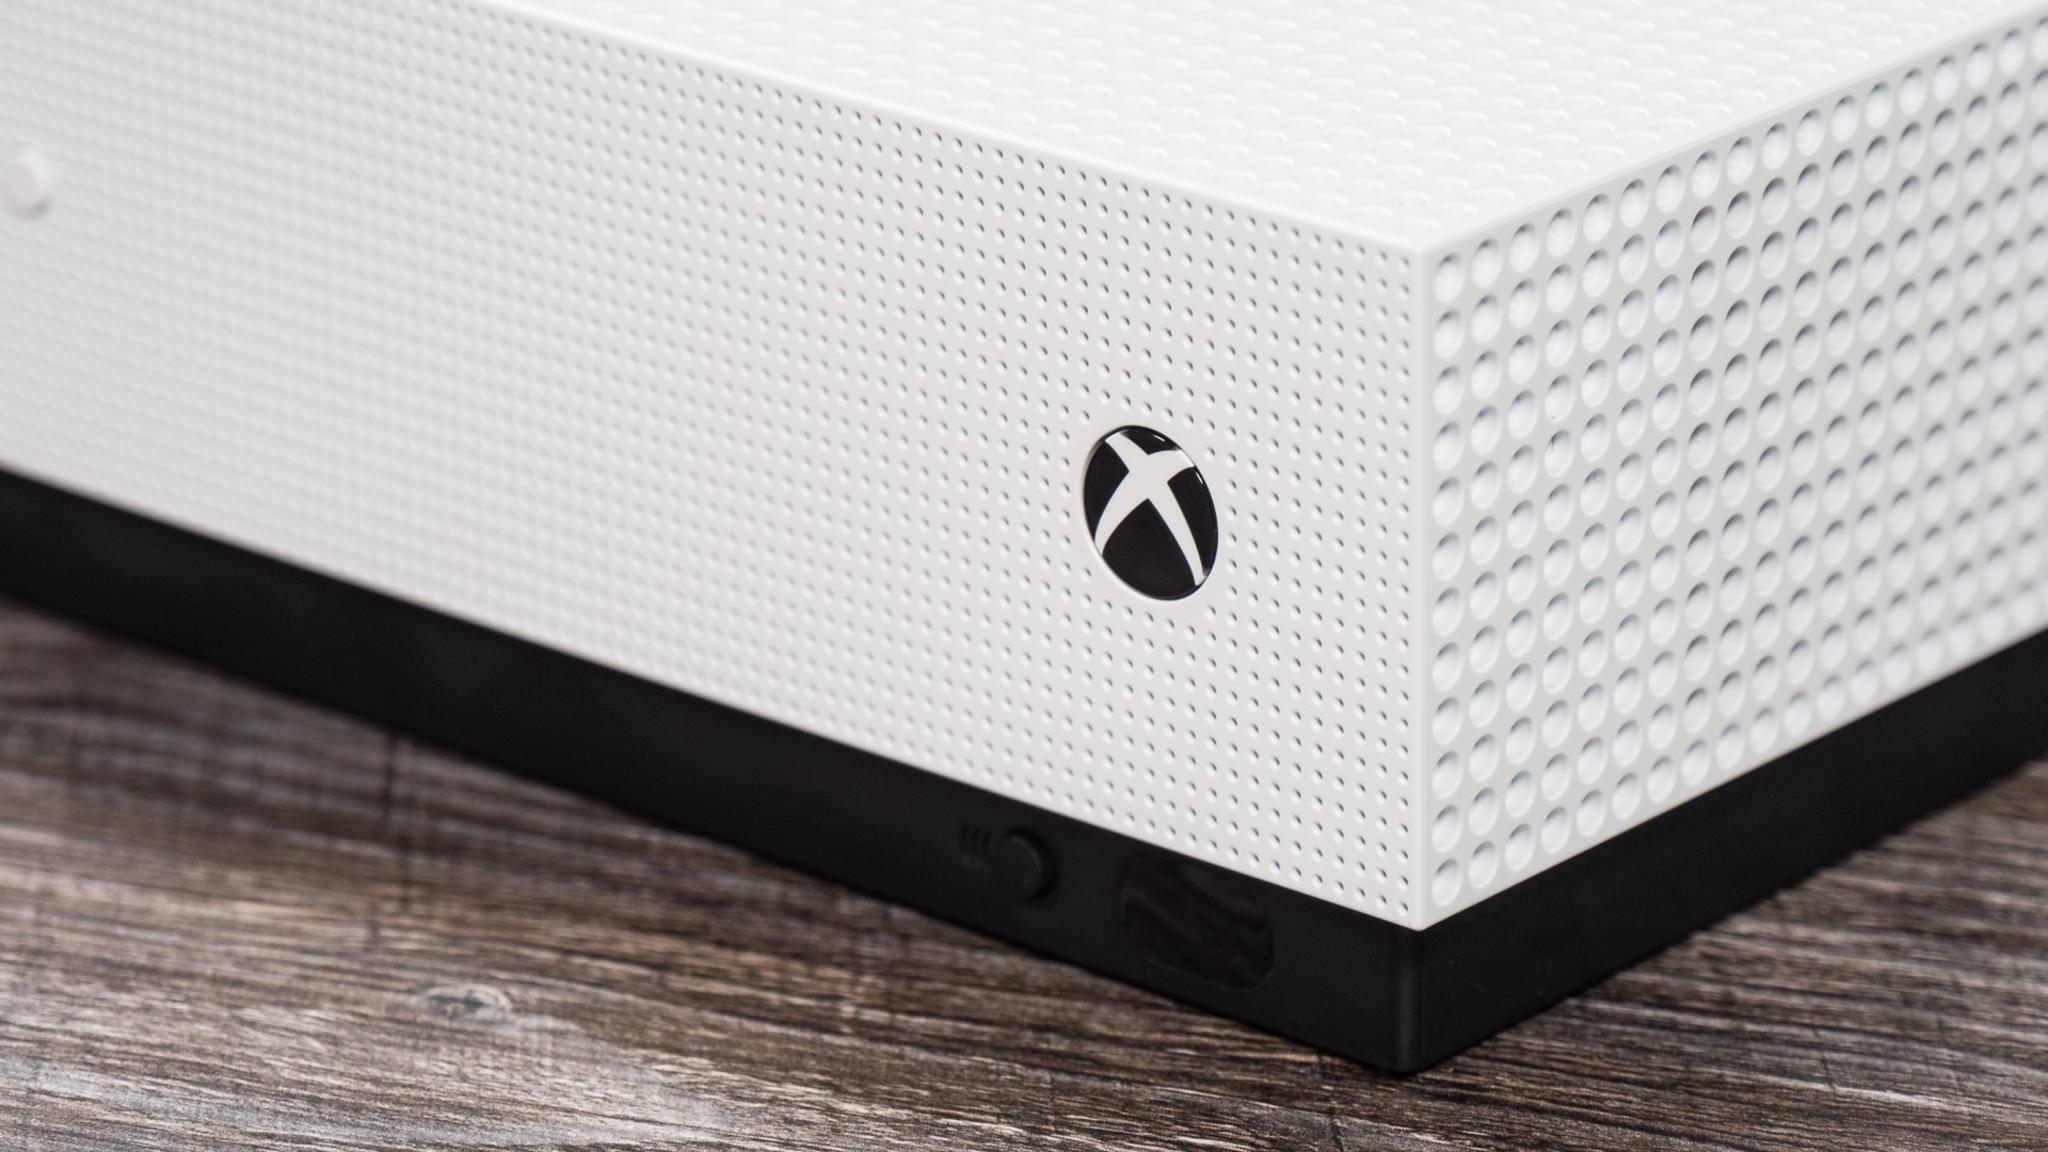 All-Digital Edition: Xbox One ohne Laufwerk soll Anfang Mai kommen